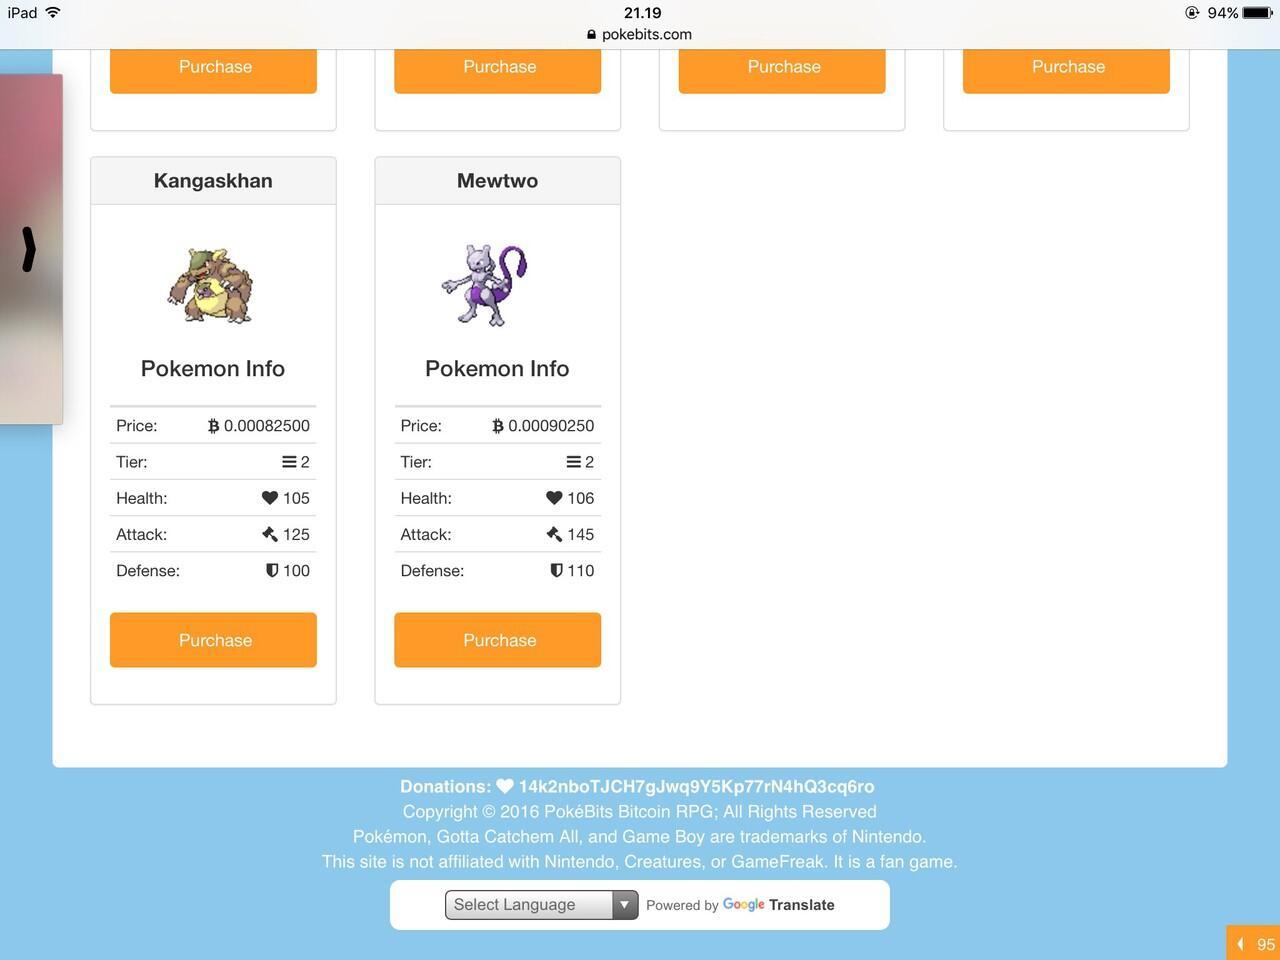 Mining bitcoin + main RPG pokemon? Waw free no depo2 an.. | KASKUS